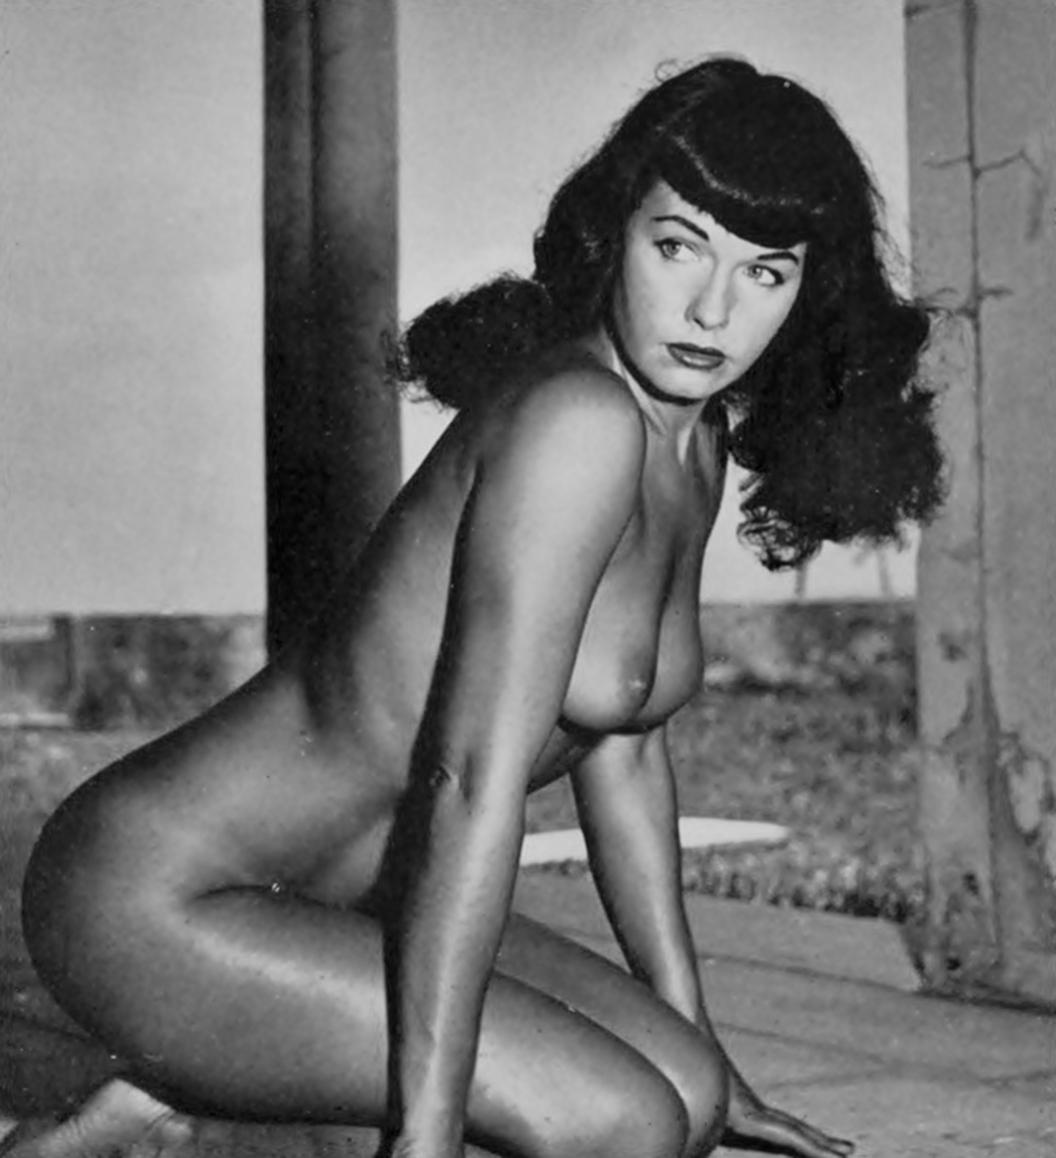 Nude female sports star photos